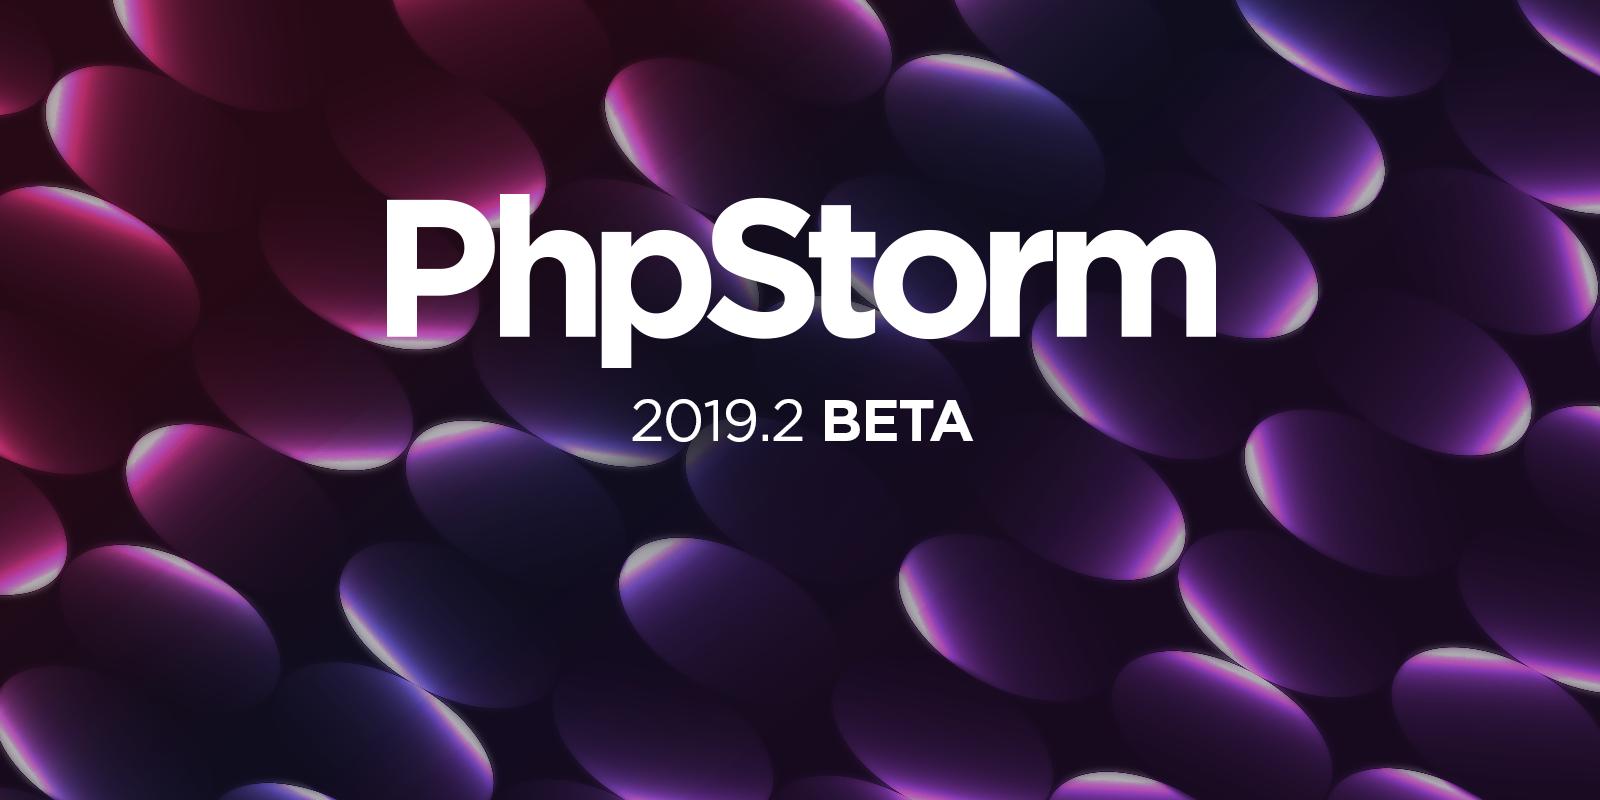 PhpStorm 2019.2 Beta